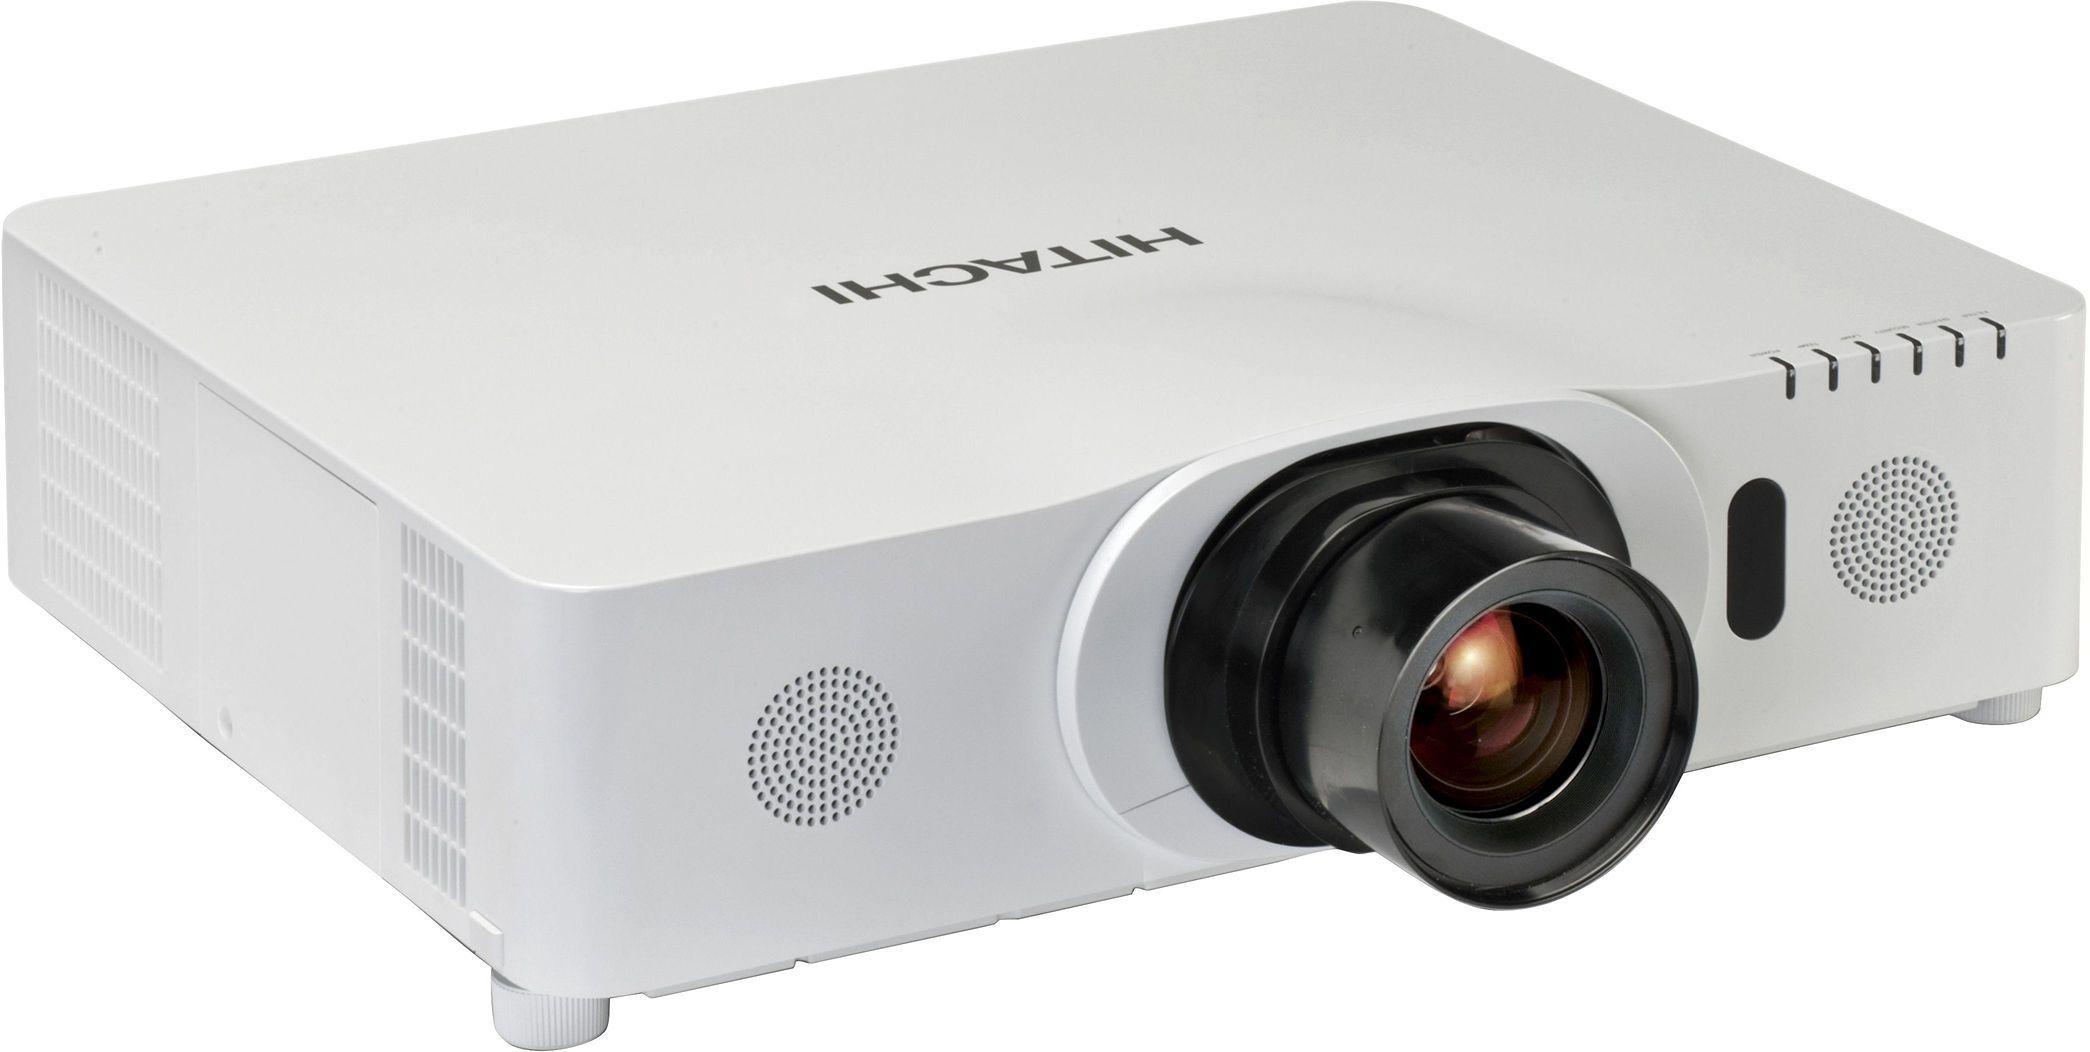 Hitachi CP-WU8450-R 3LCD Projector, Refurbished